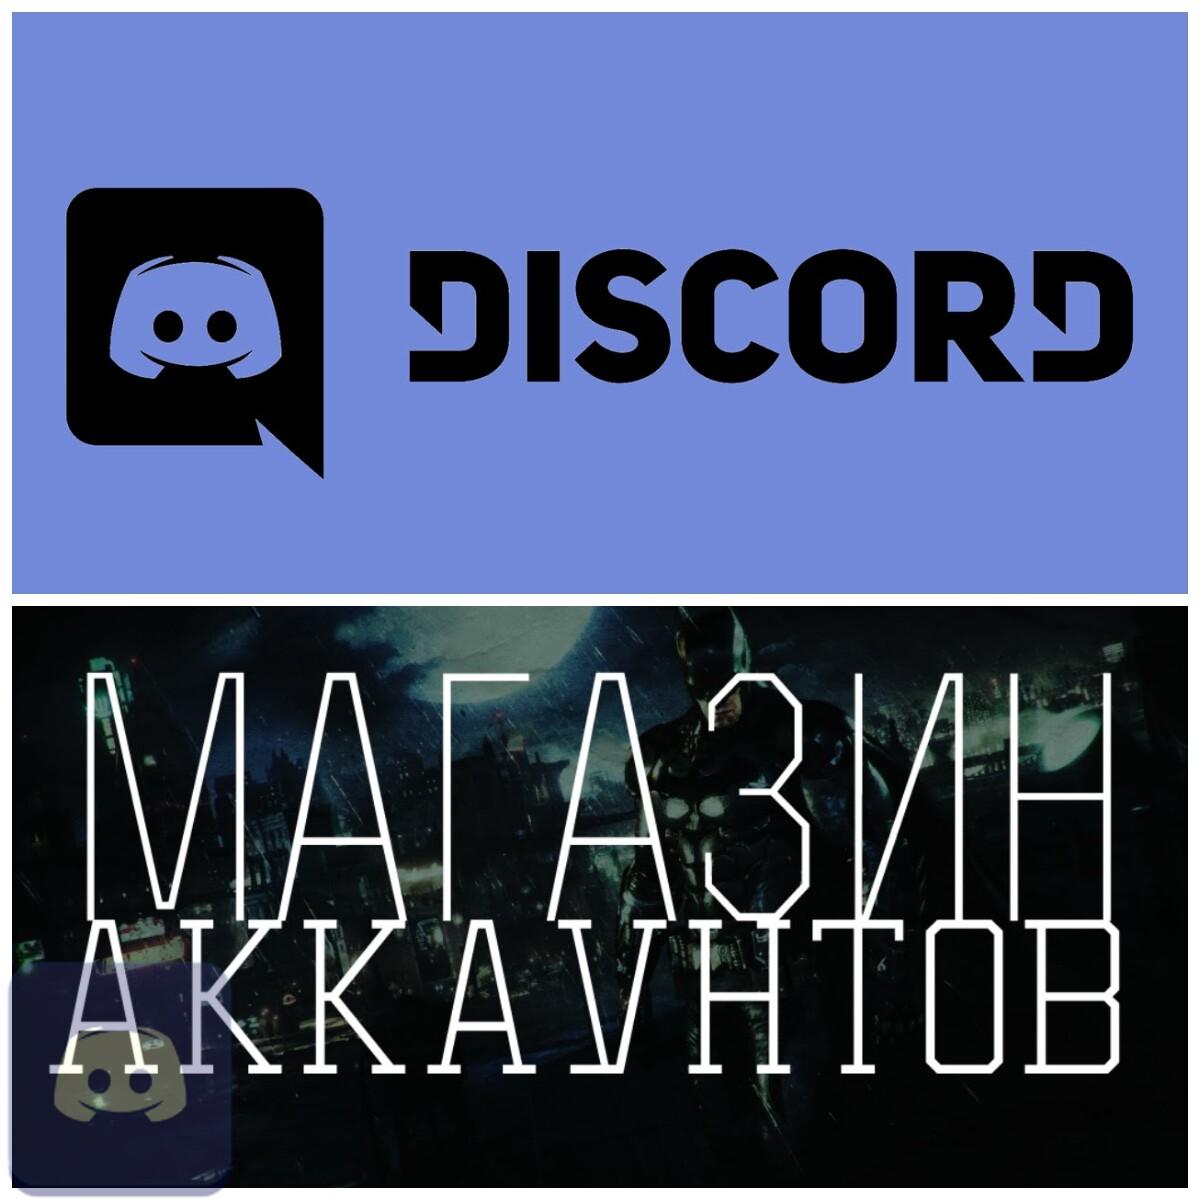 acsdiscord1